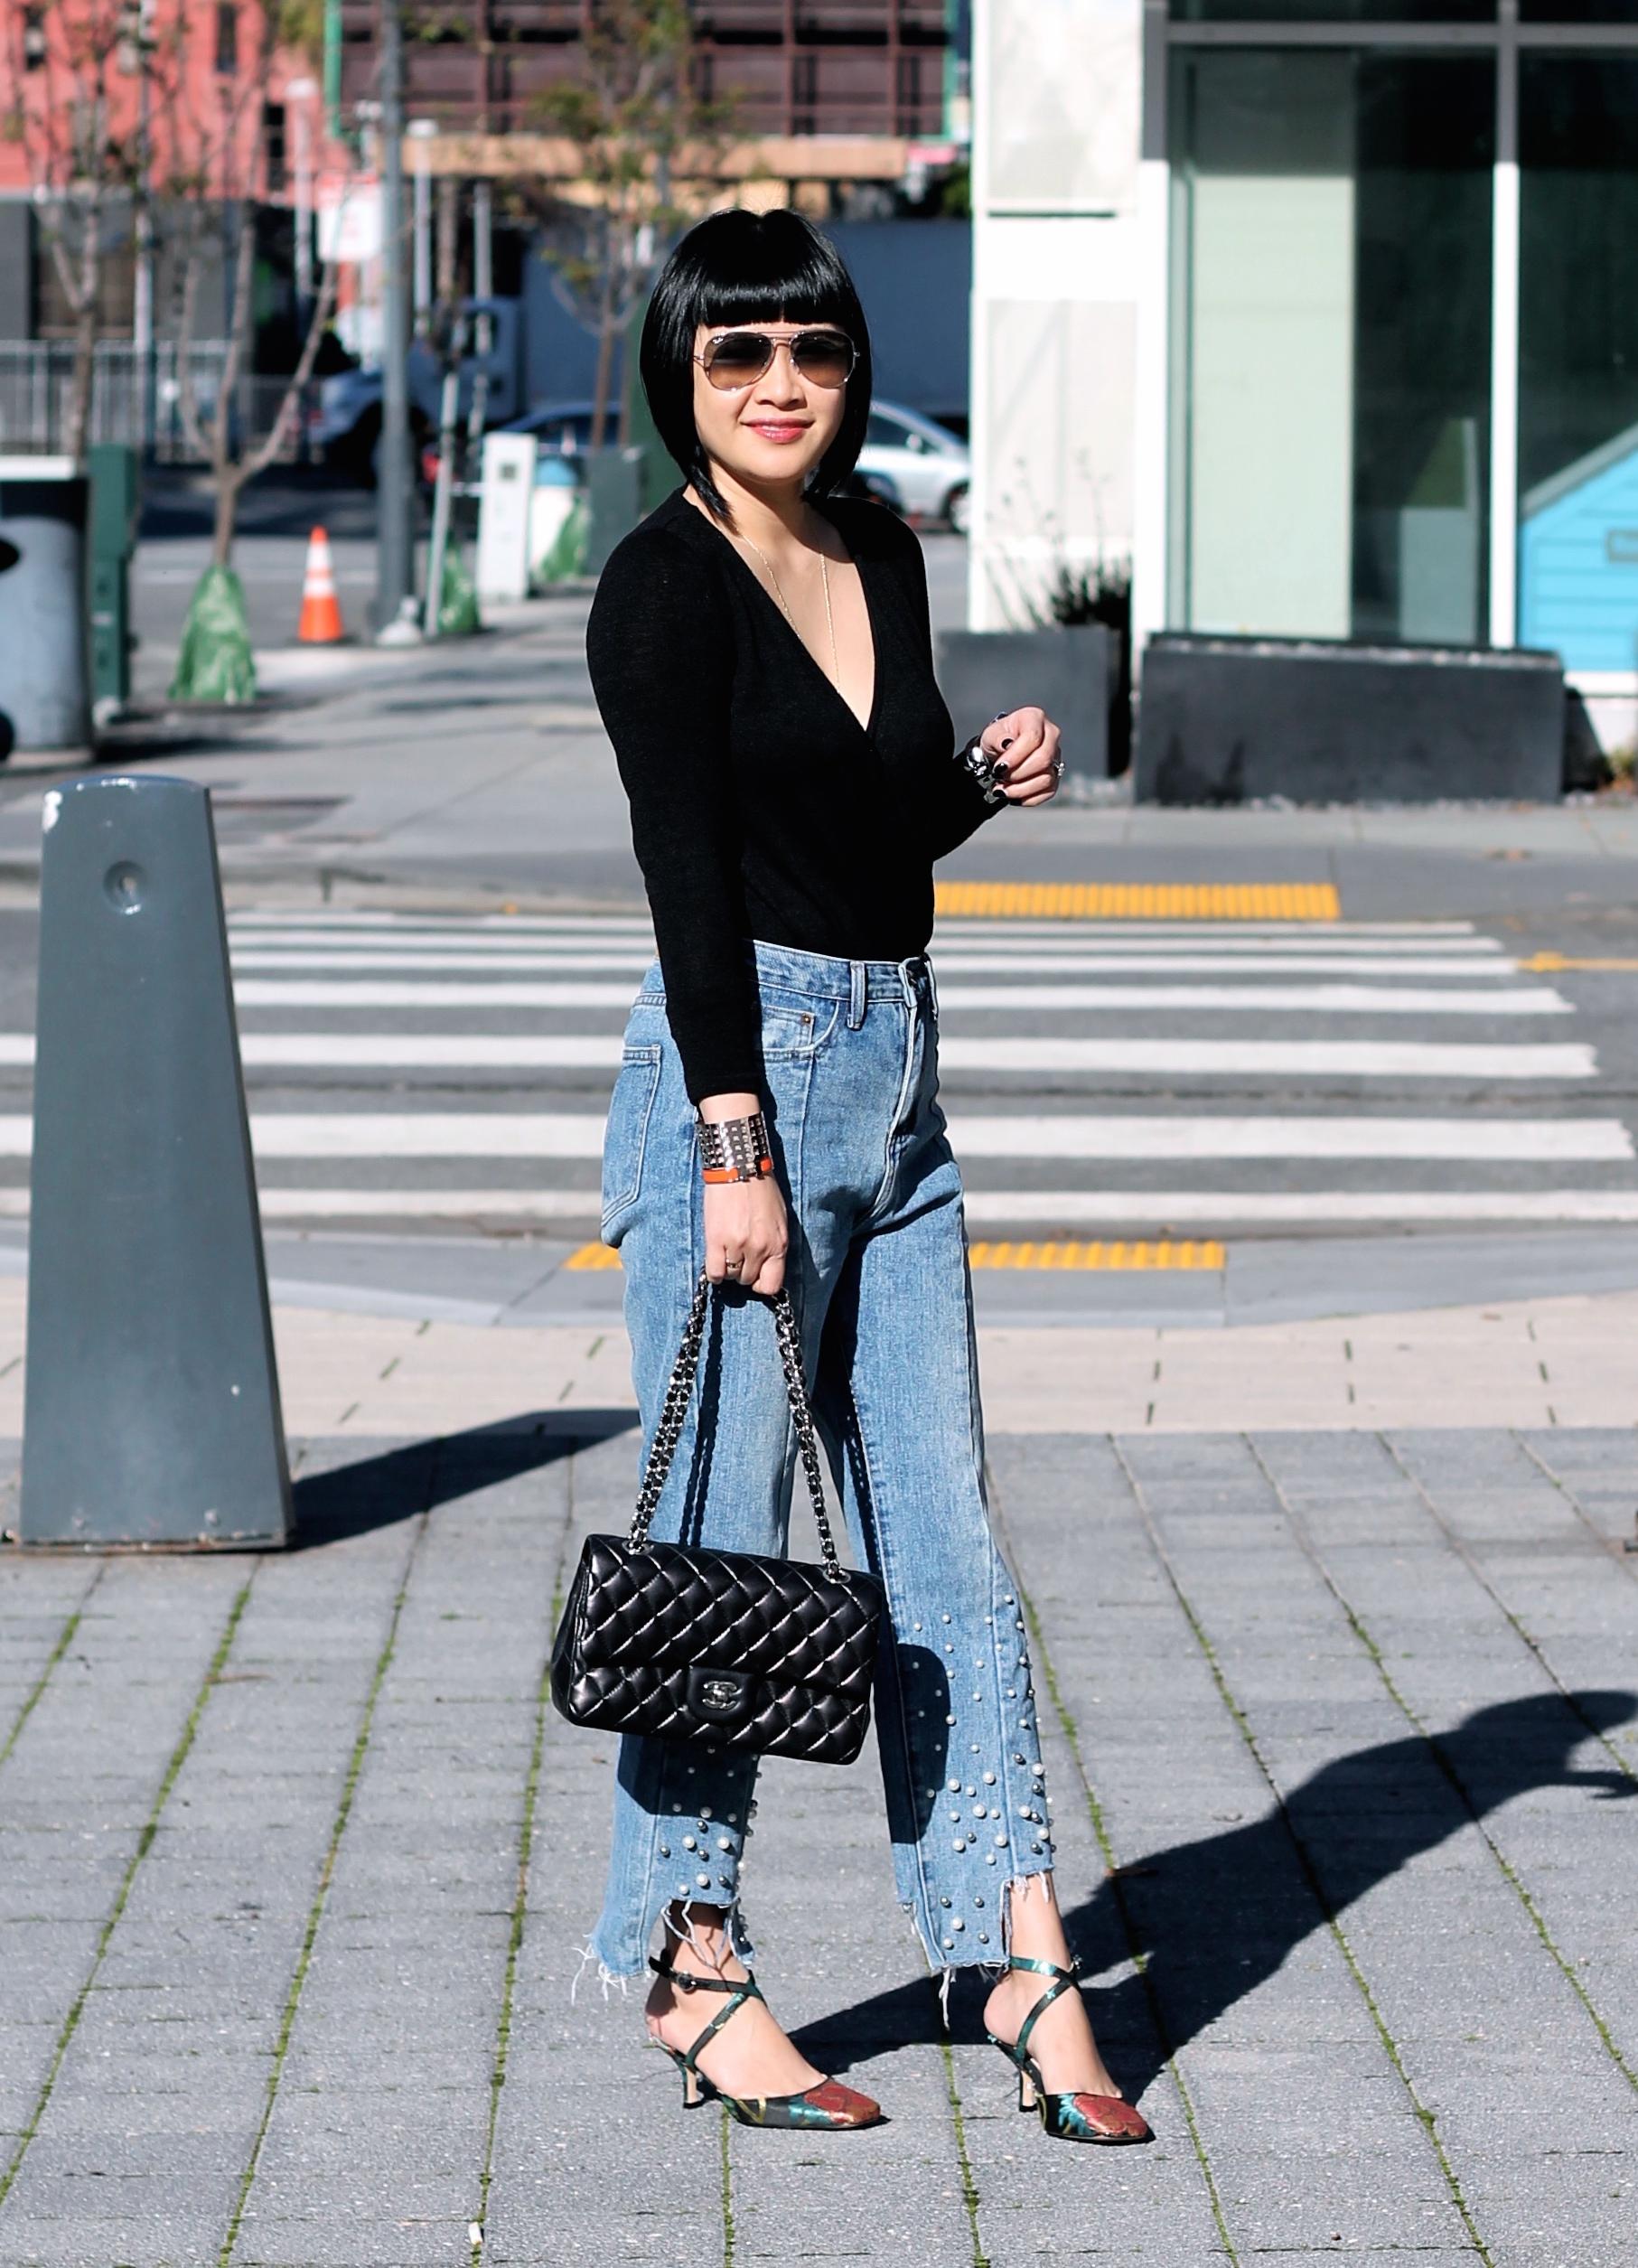 Storets jeans, Aritzia top, Zara shoes, Ray-Ban sunglasses, Chanel bag